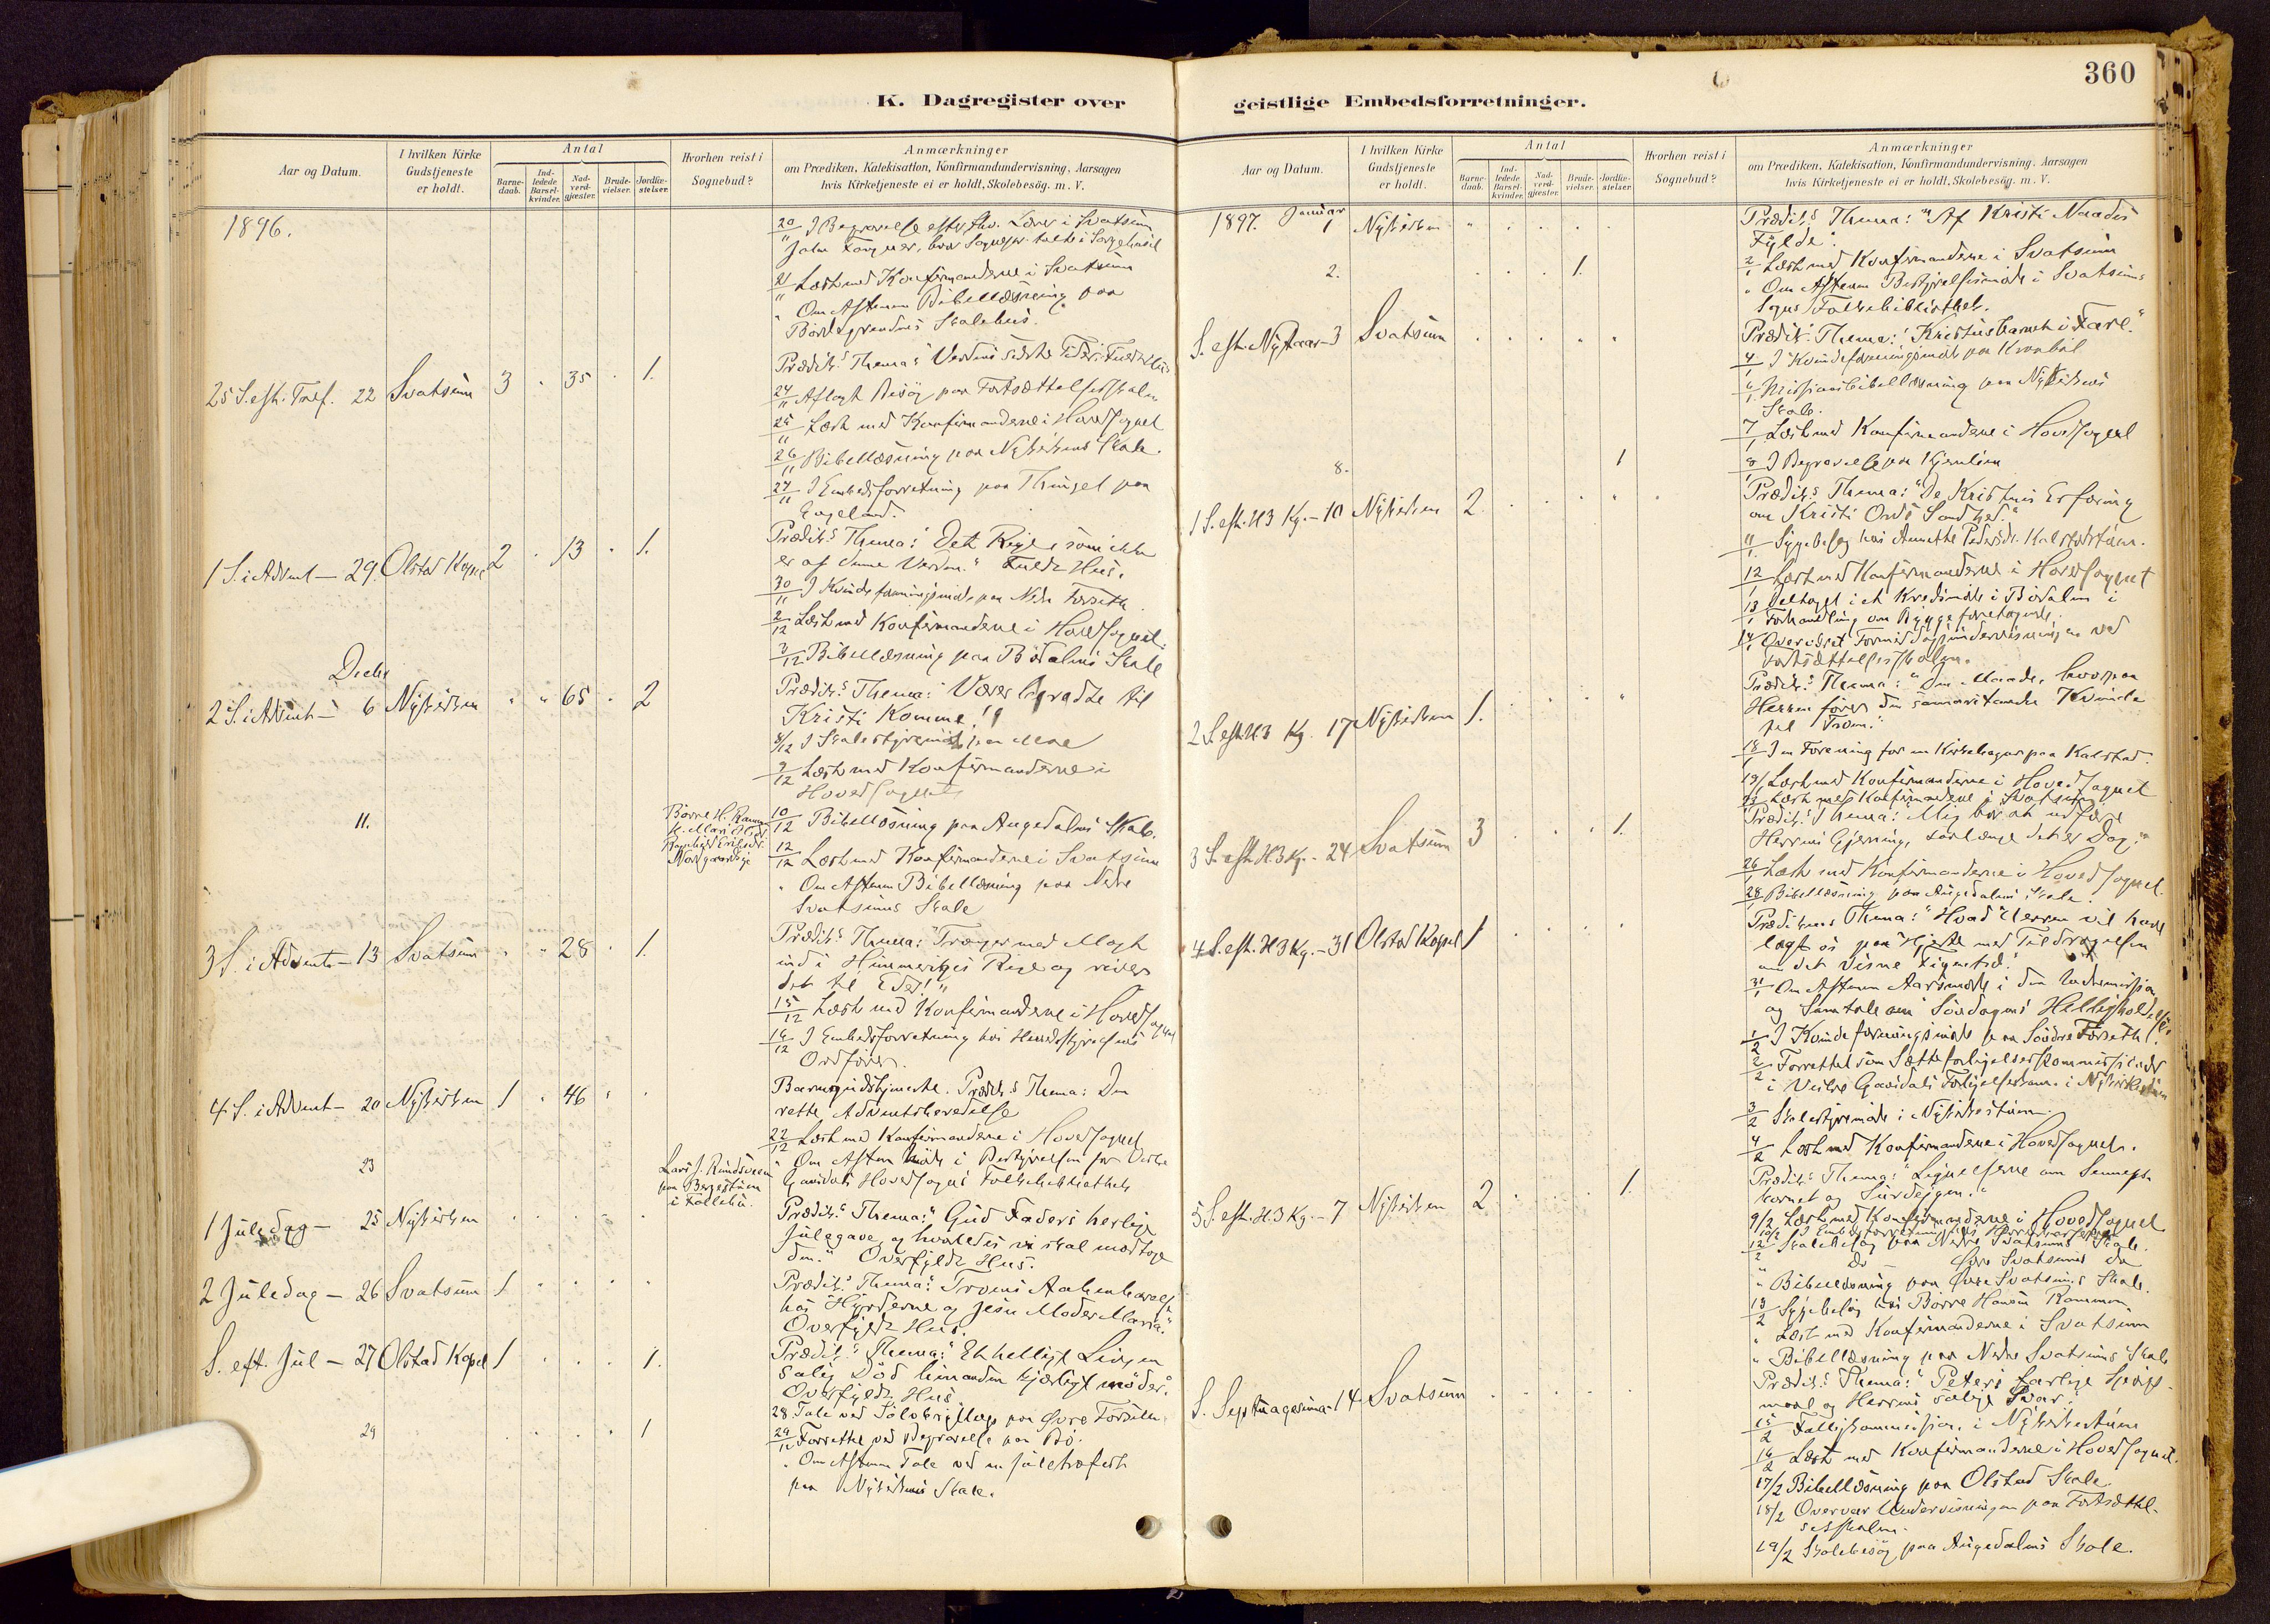 SAH, Vestre Gausdal prestekontor, Ministerialbok nr. 1, 1887-1914, s. 360